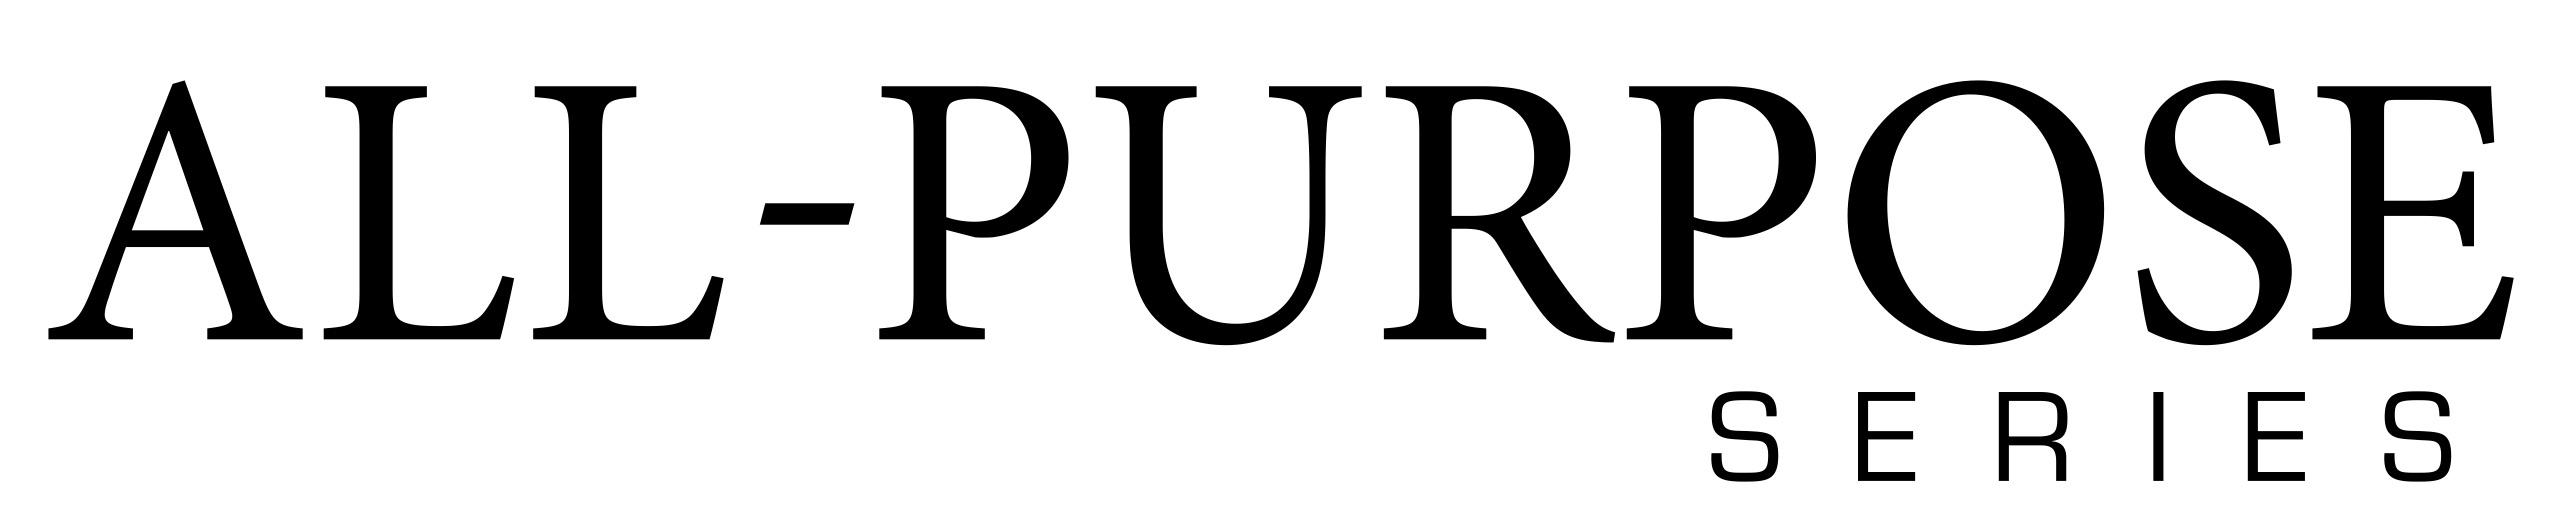 all-purpose-series.jpg